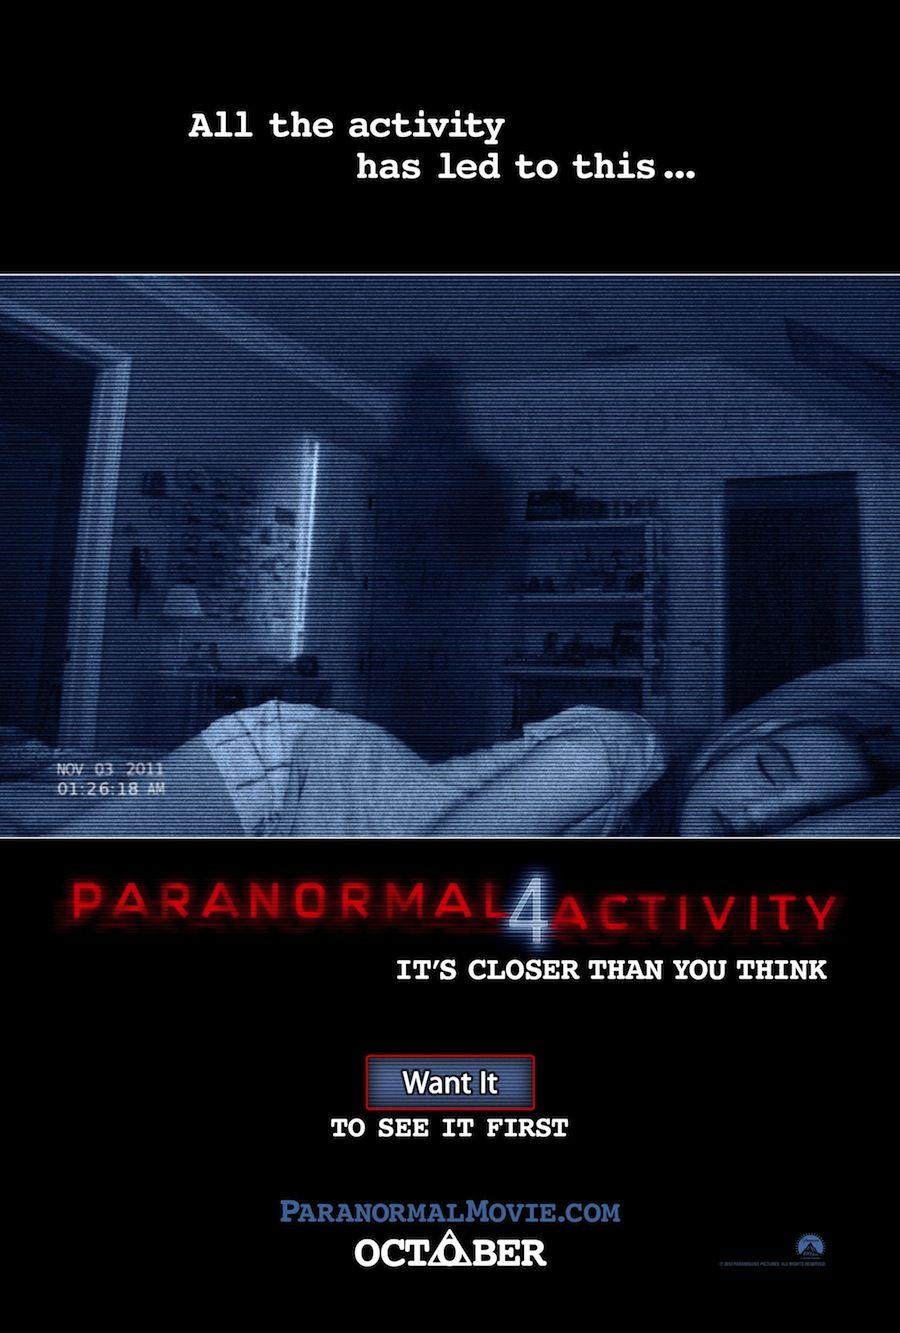 Paranormal Activity 4 Paranormal Activity 4 Paranormal Activity Movie Paranormal Activity